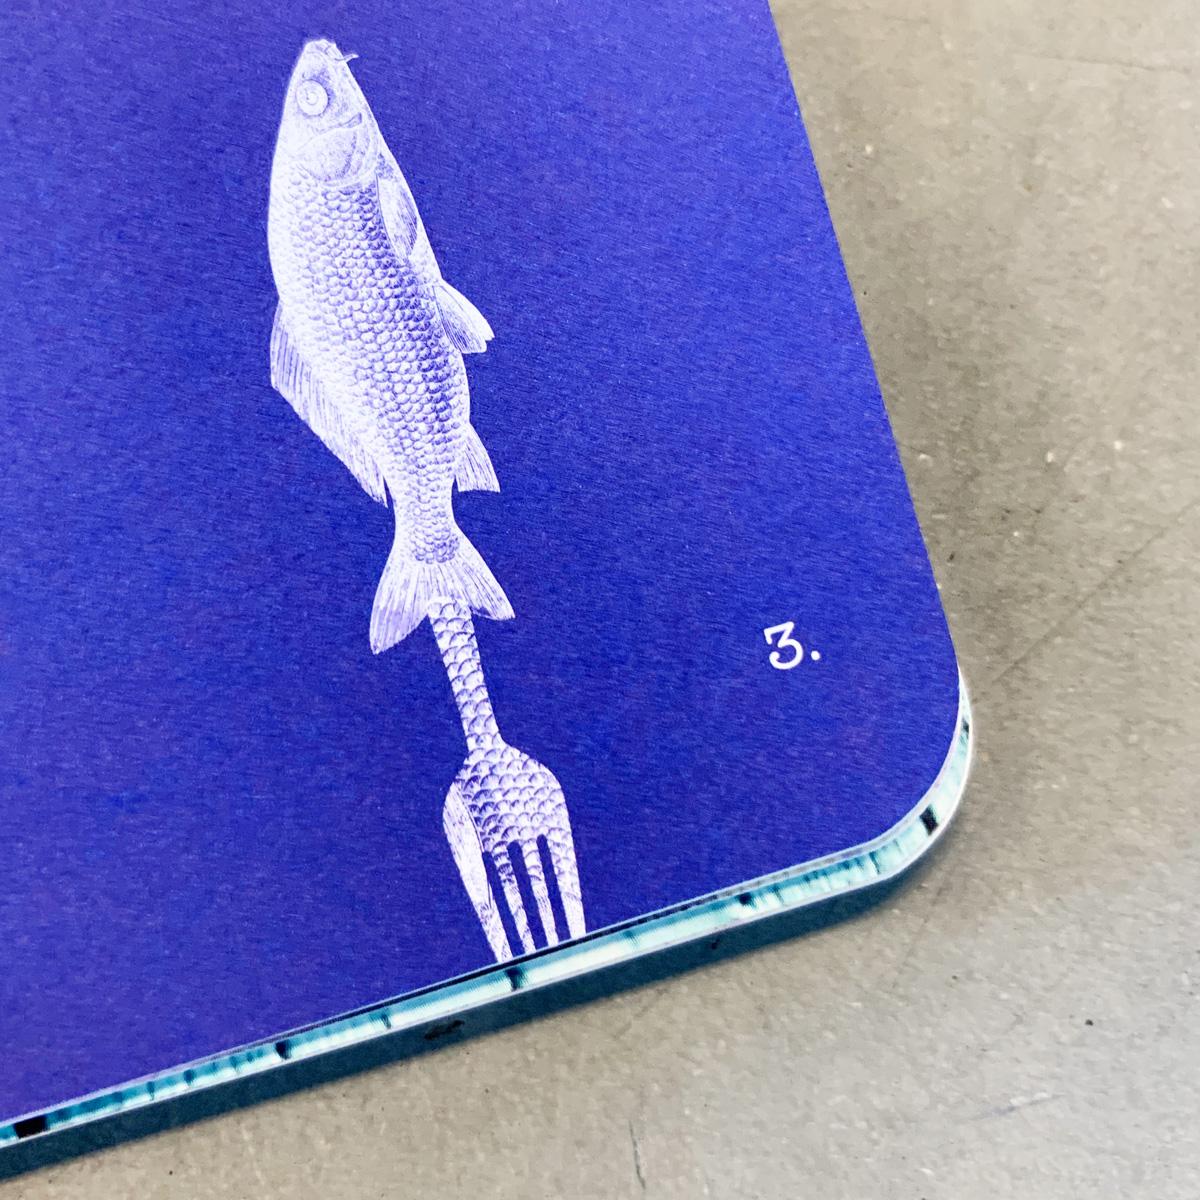 Design van boekje 'My Favorite Fish Dish'